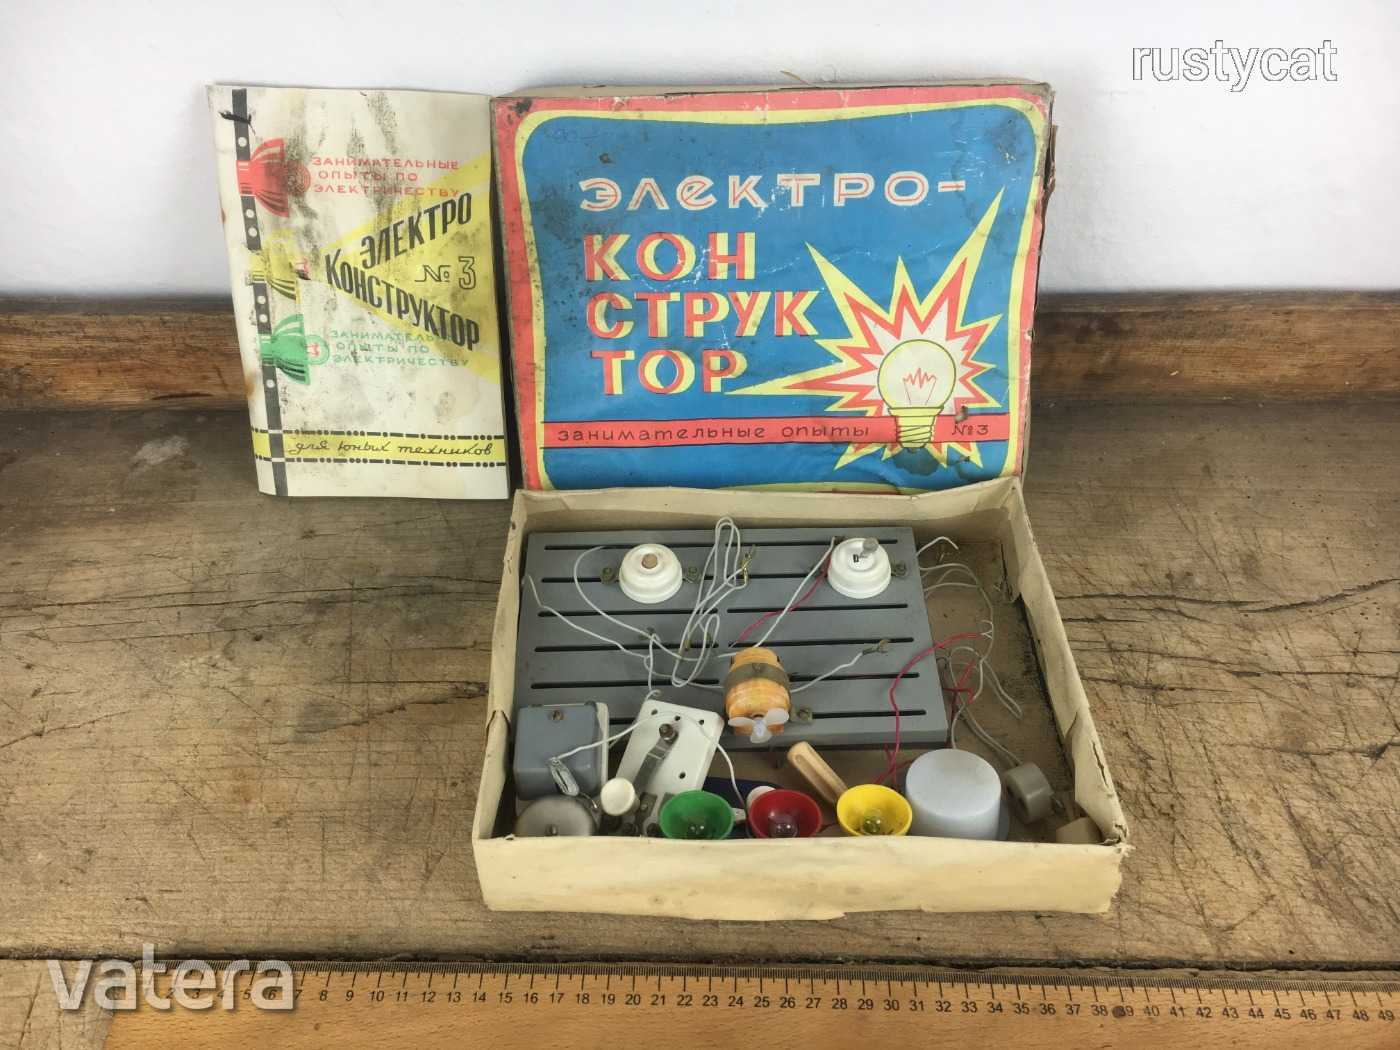 ac291-regi-aramkoros-orosz-jatek-d46b_2_big.jpg